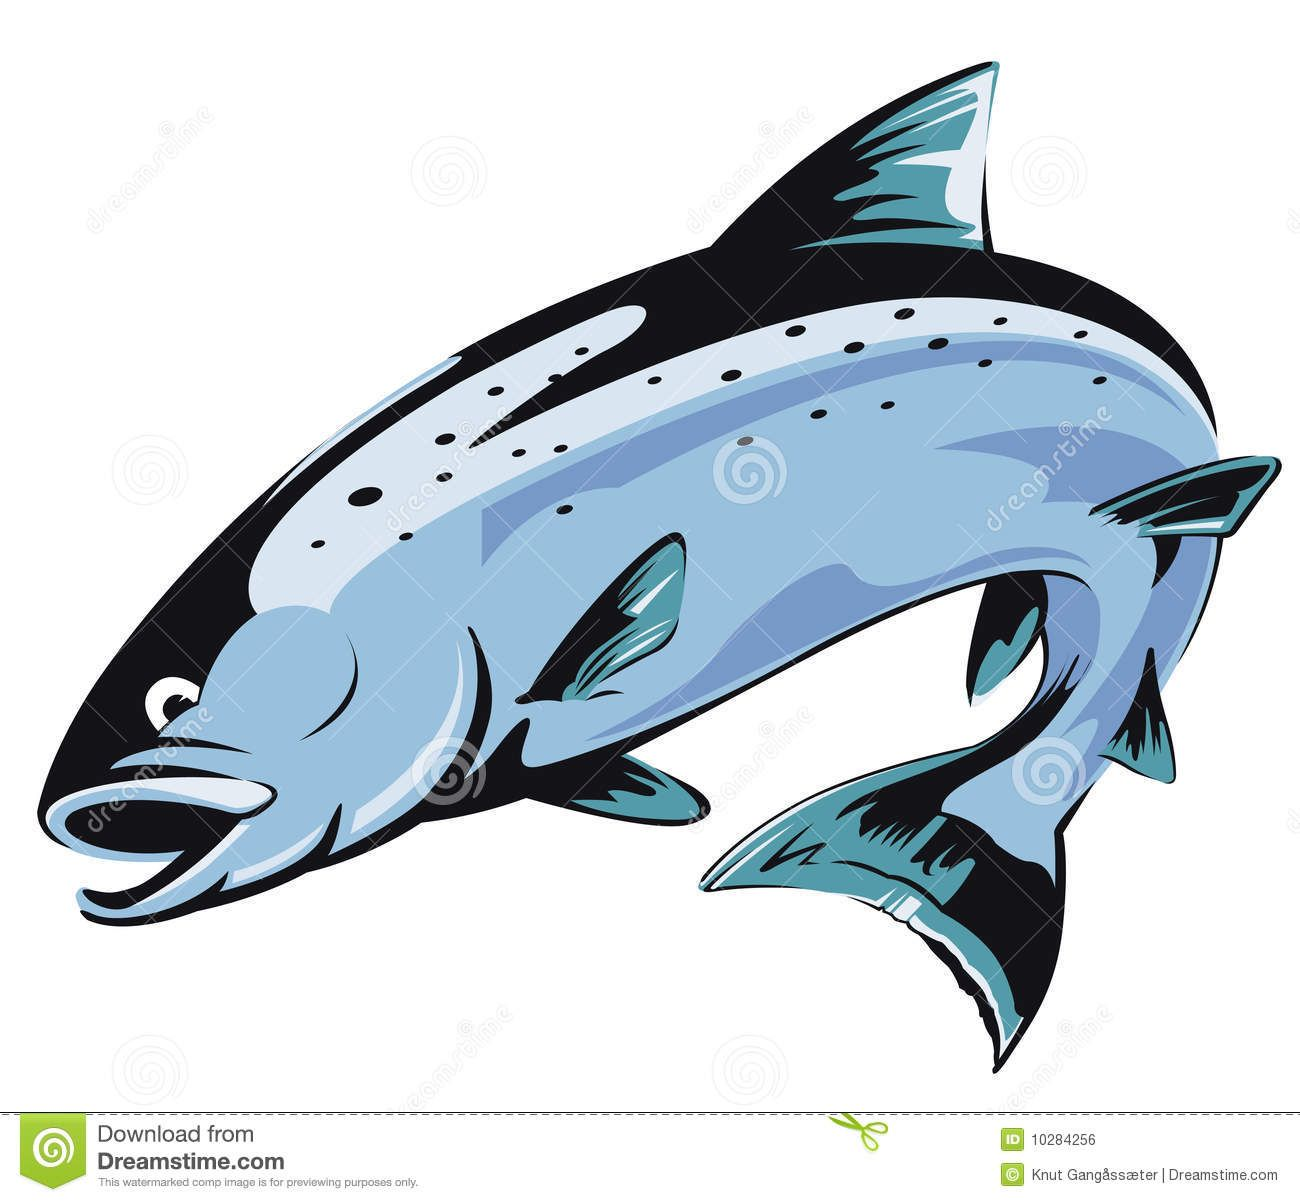 Cliparts going upstream ideas. Trout clipart salmon alaskan